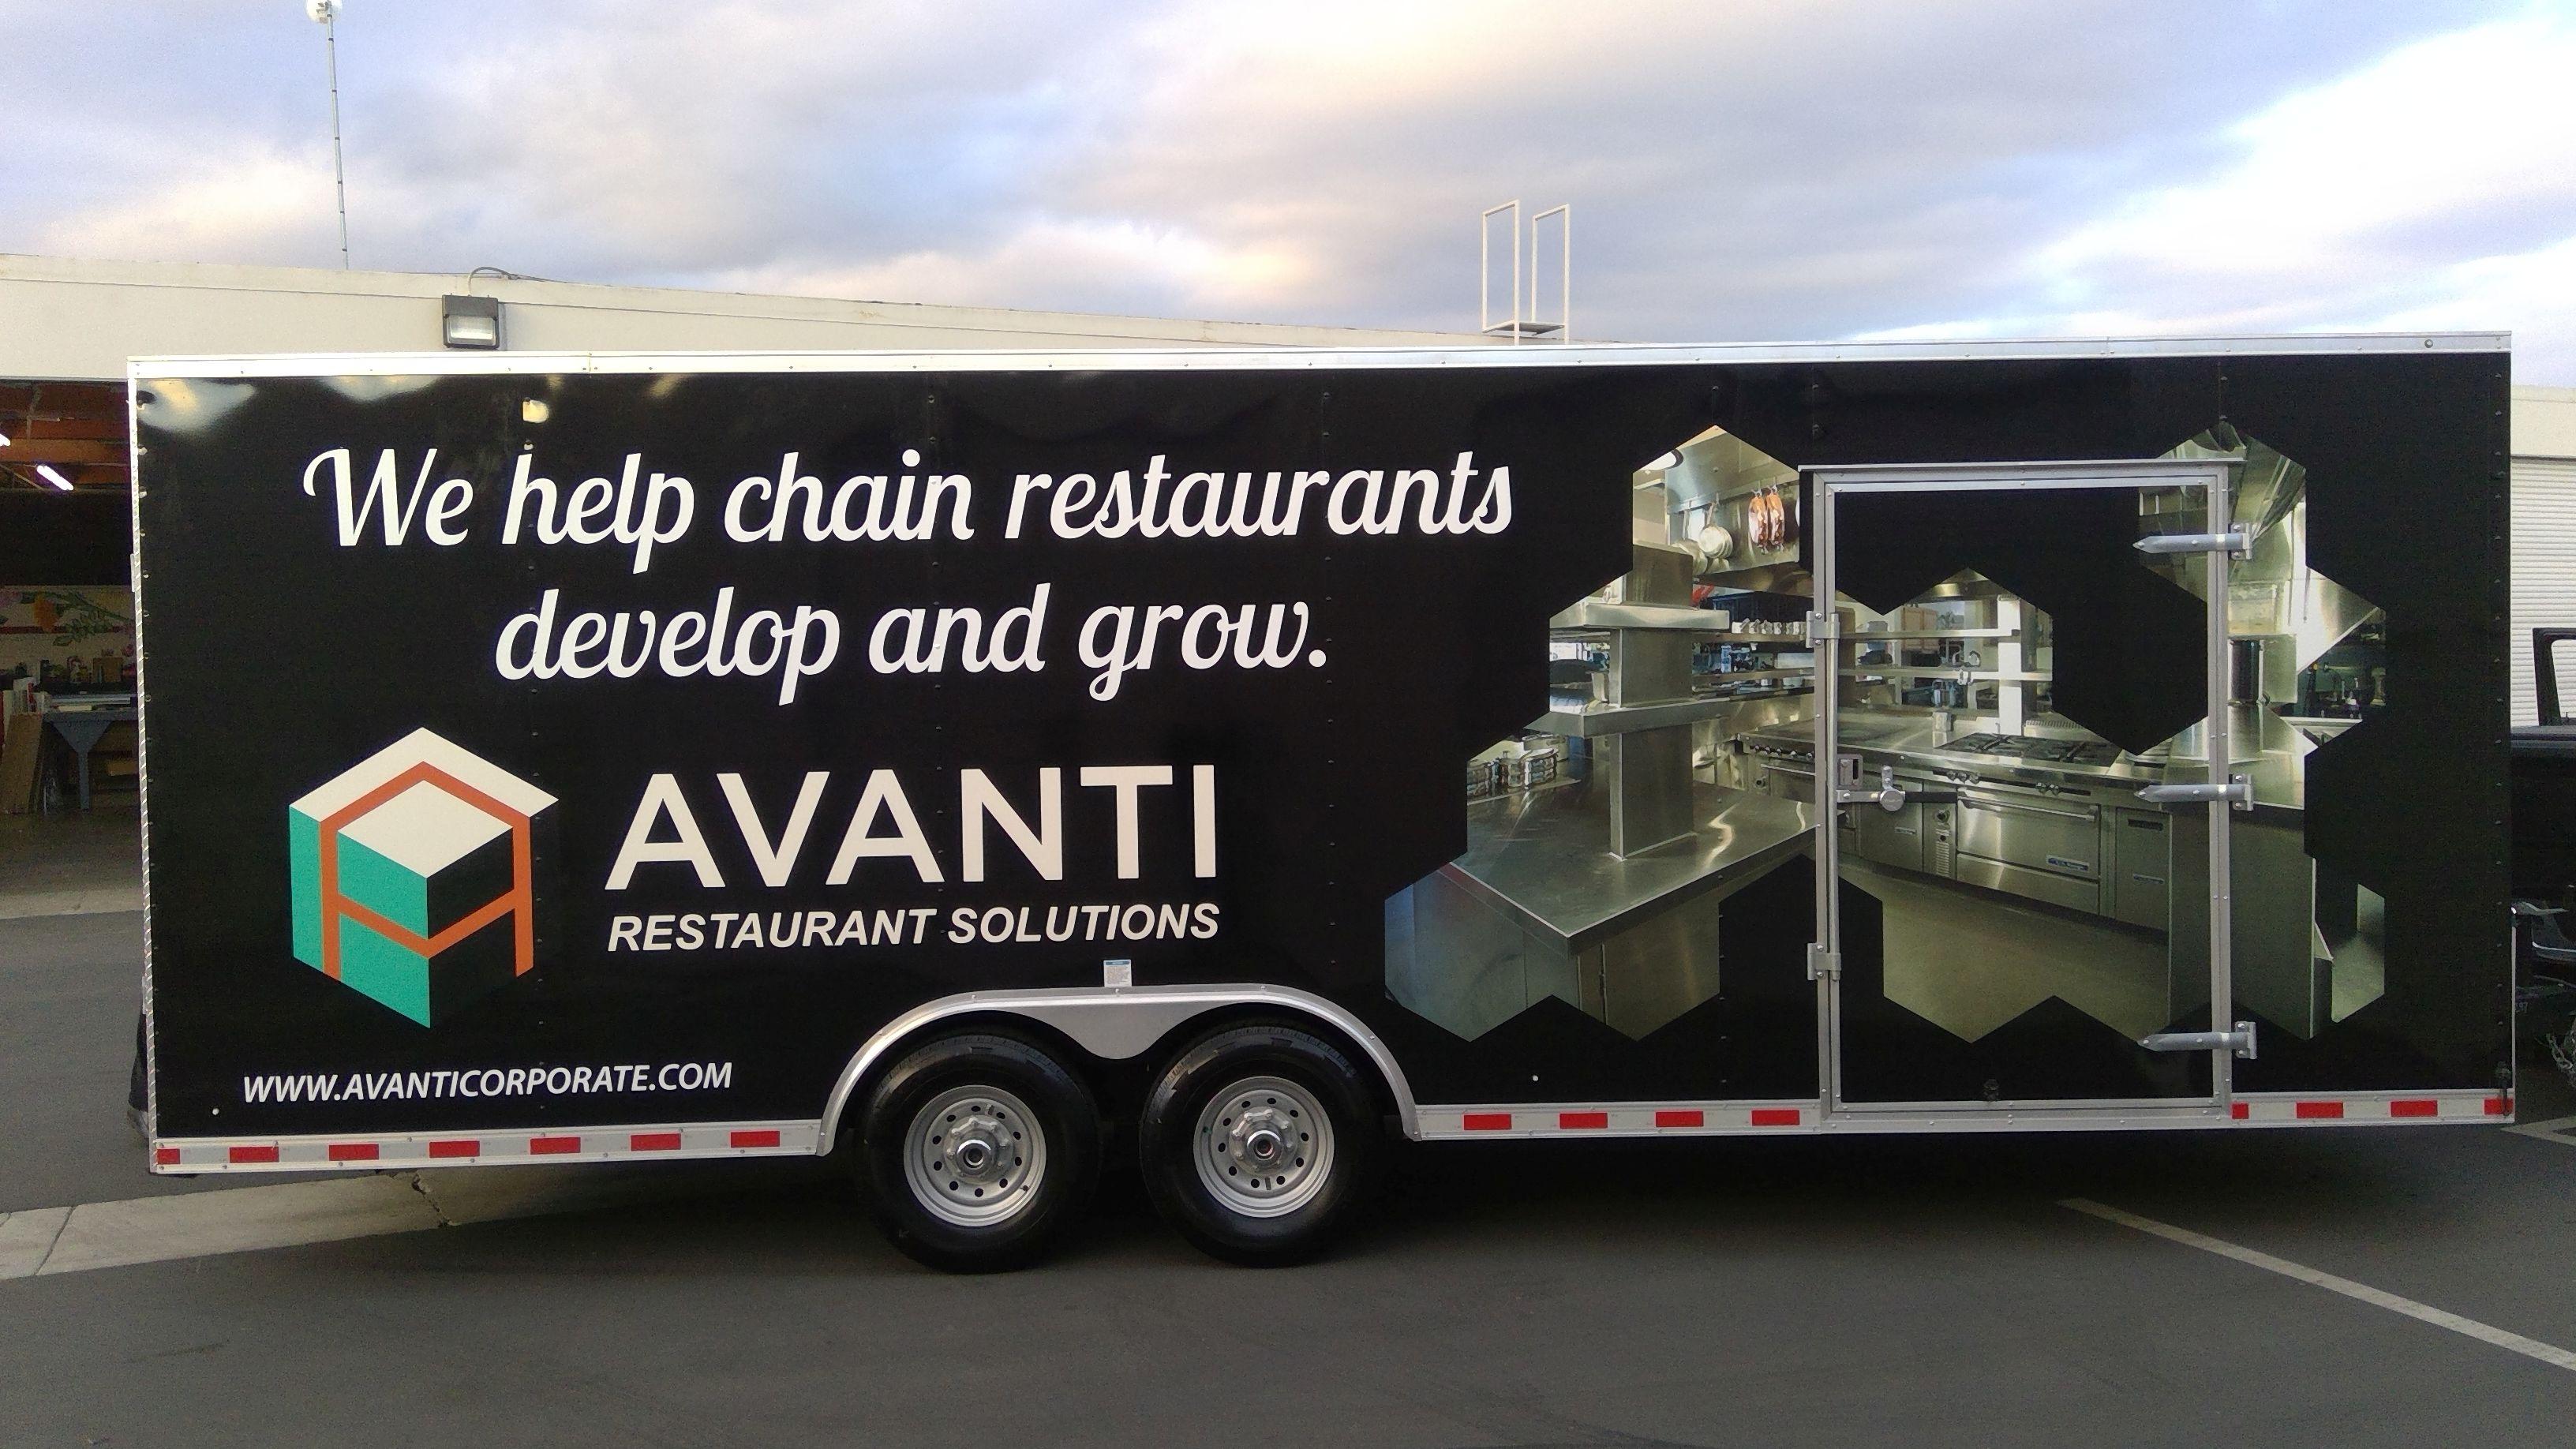 Avanti Restaurant Solutions